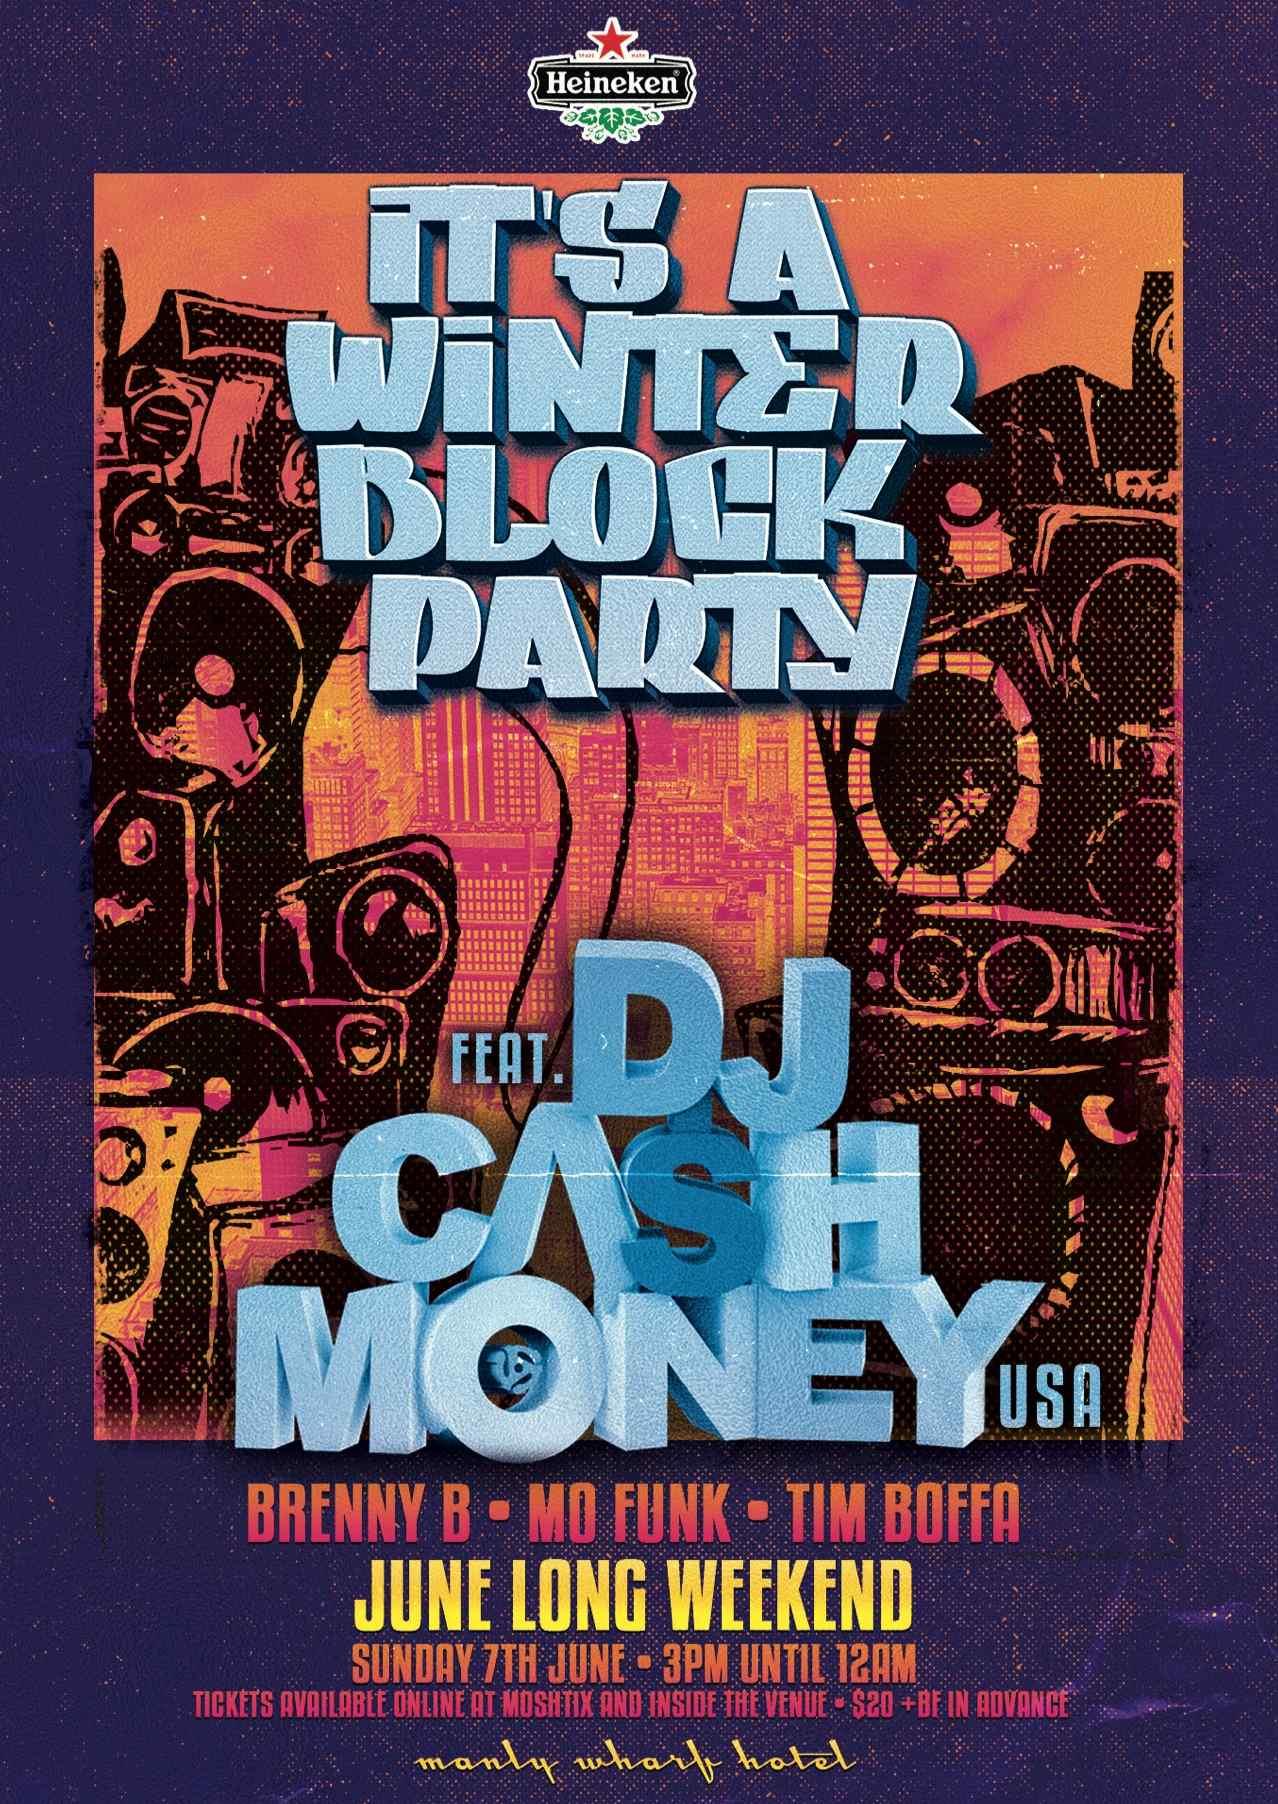 Winter Block Party feat DJ Cash Money (USA)